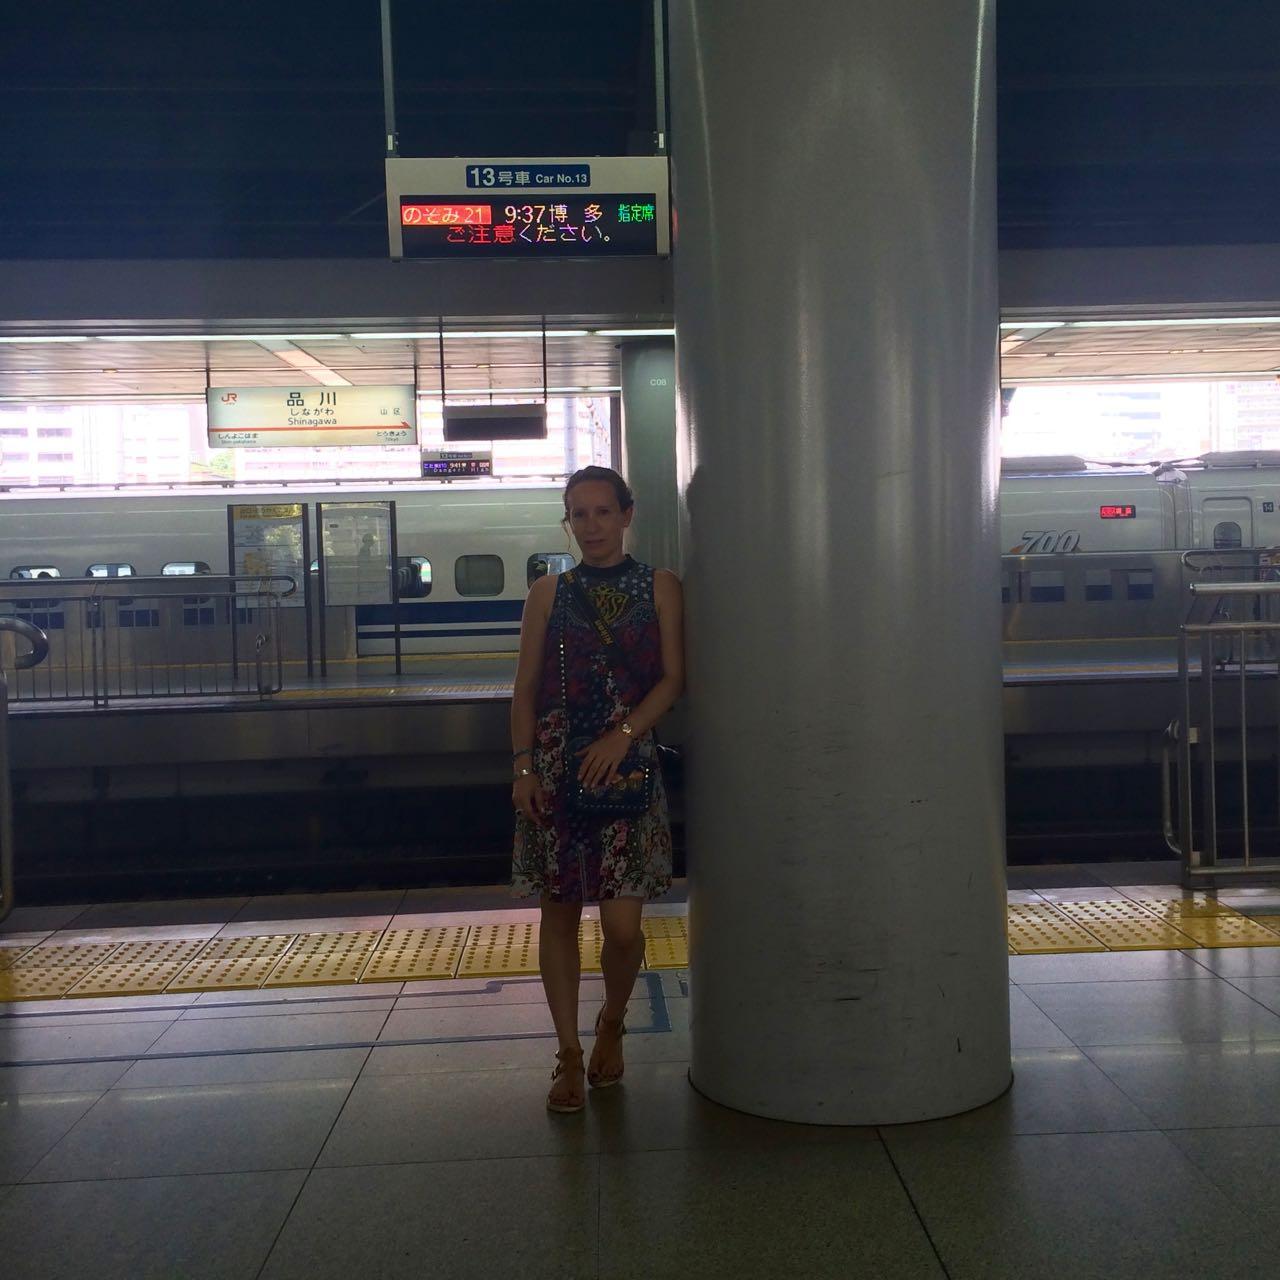 Shinkansen at Shinagawa station